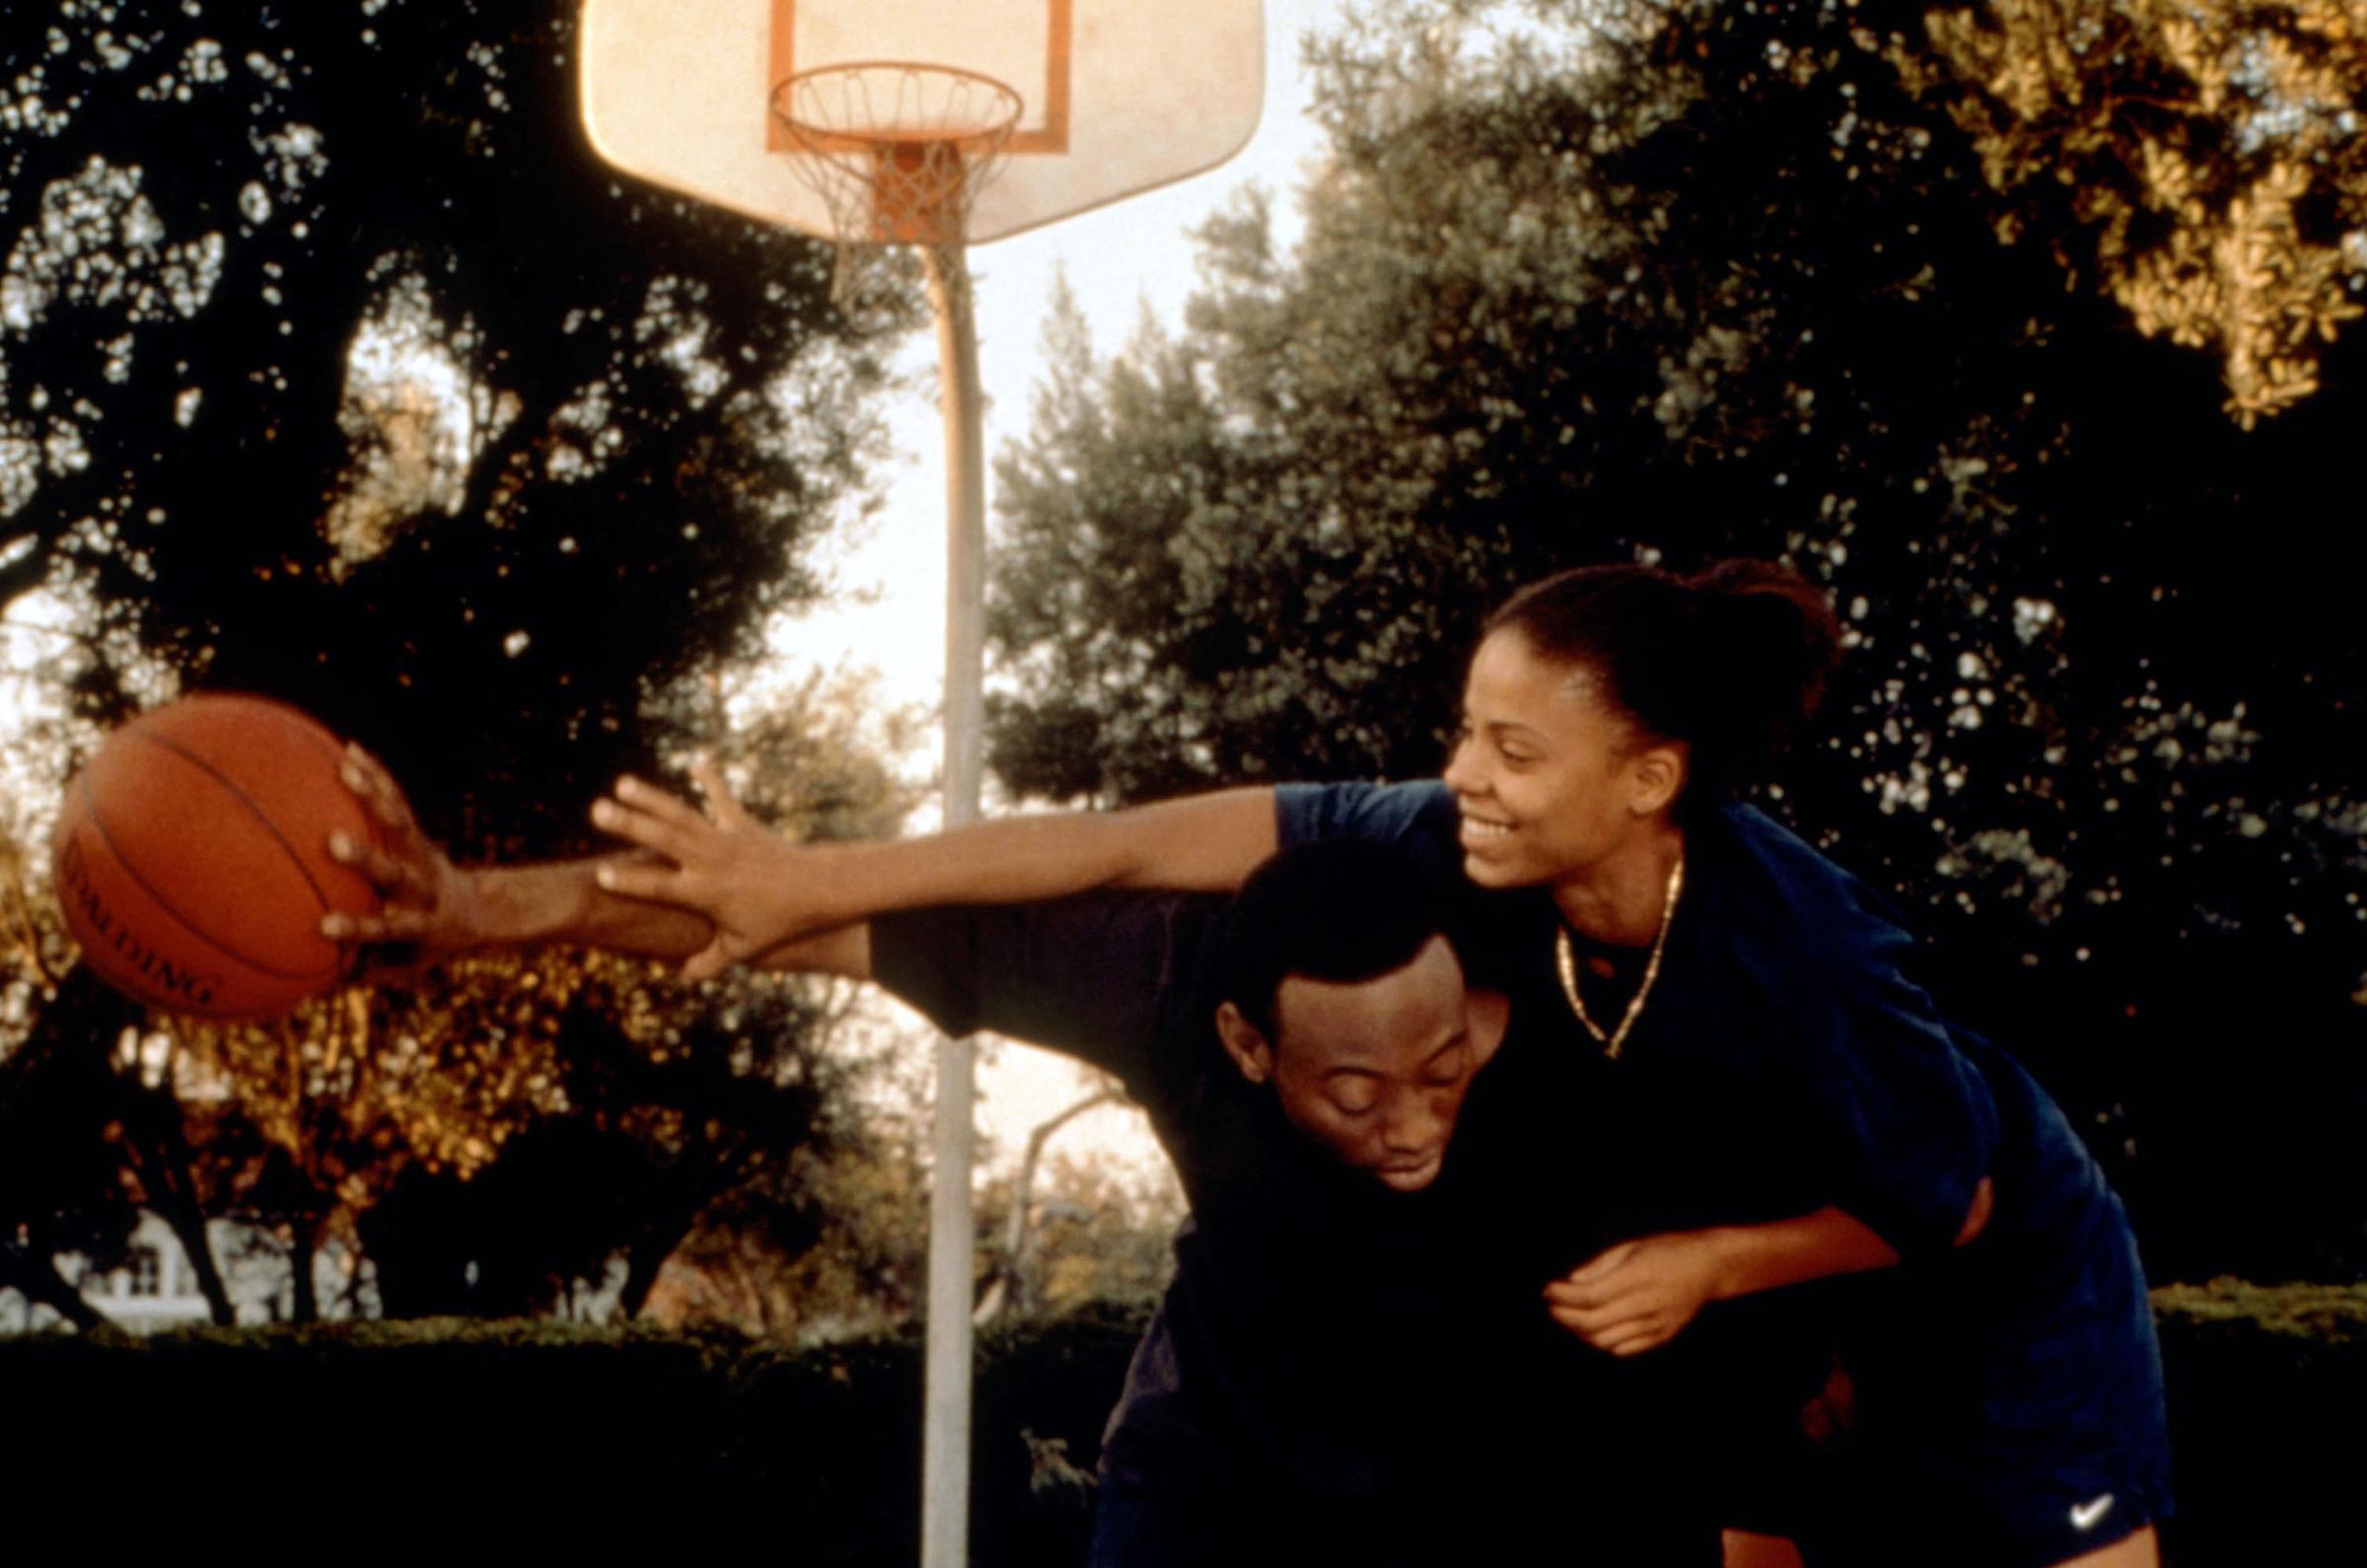 Omar Epps and Sanaa Lathan in 'Love & Basketball'.